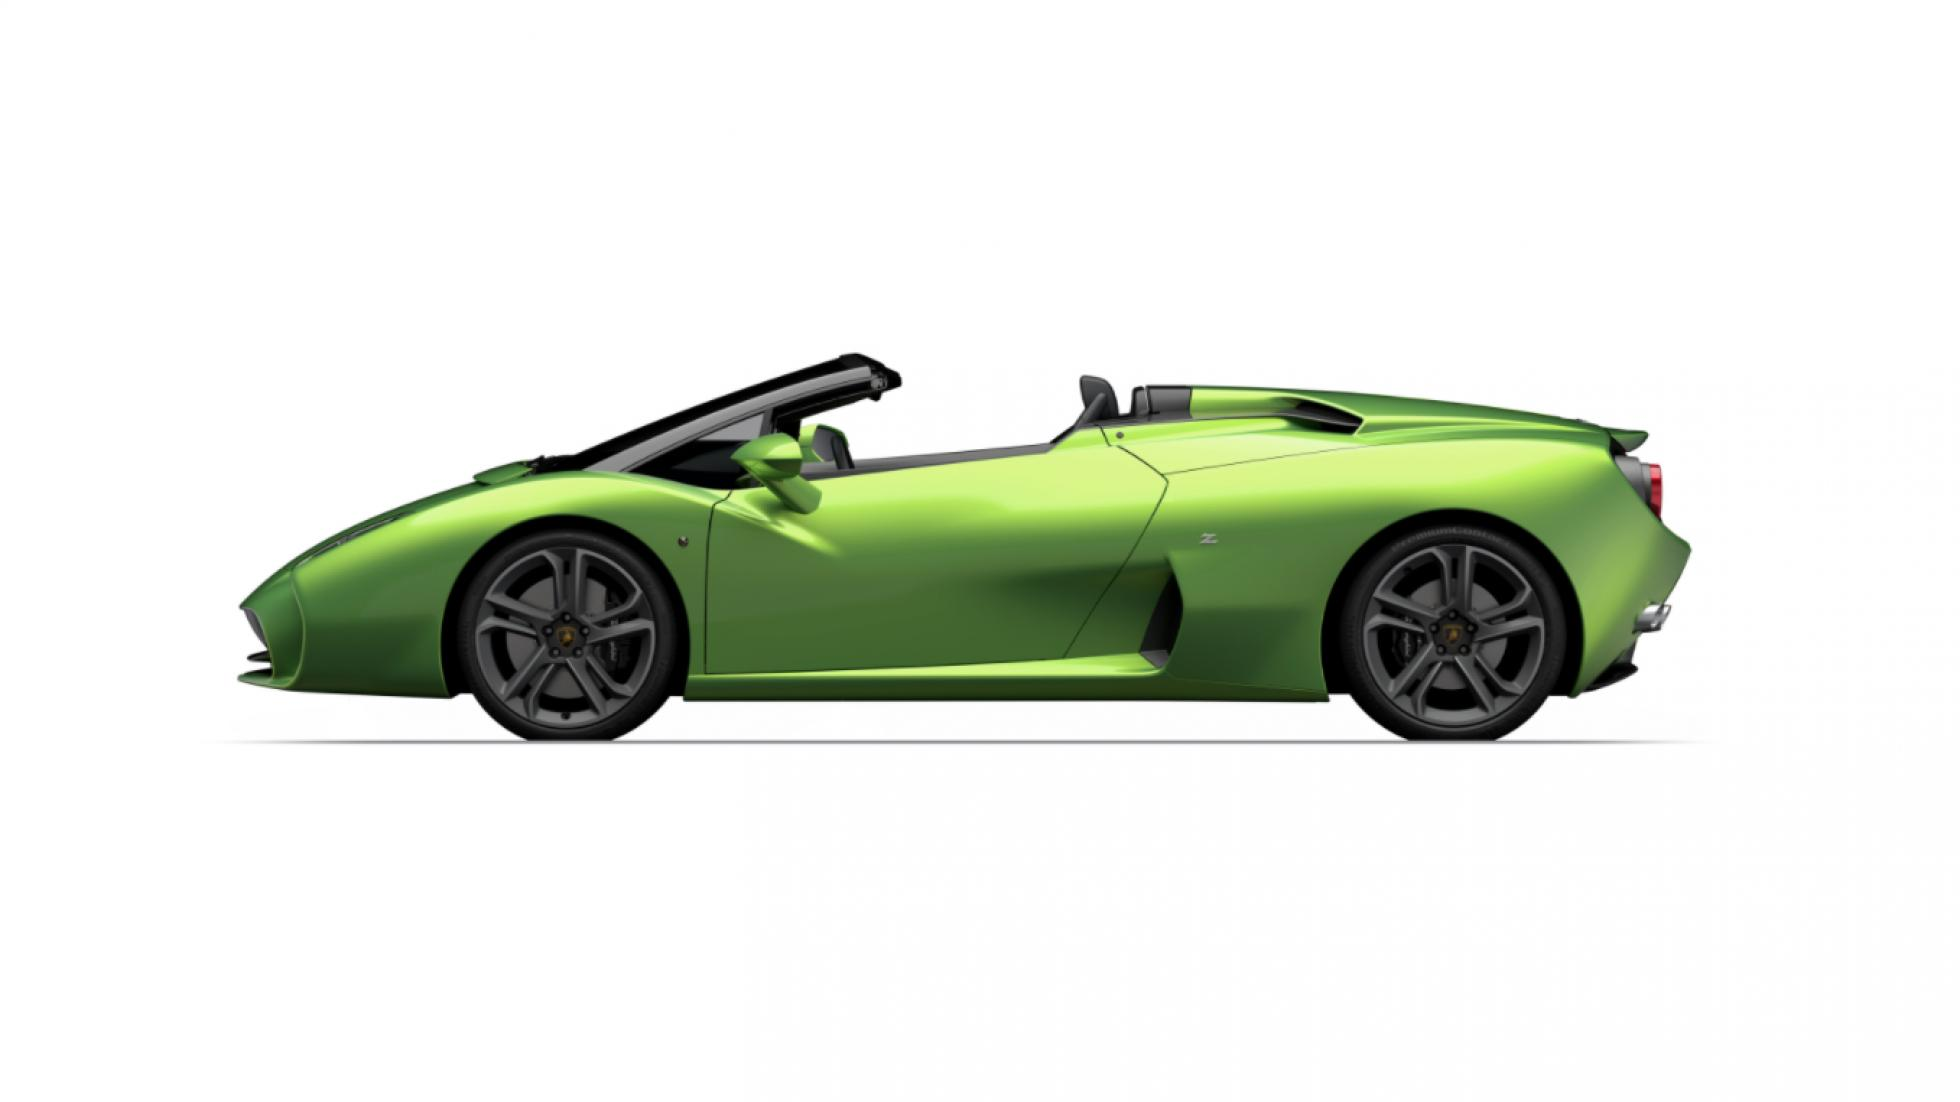 Lamborghini '595' Spyder